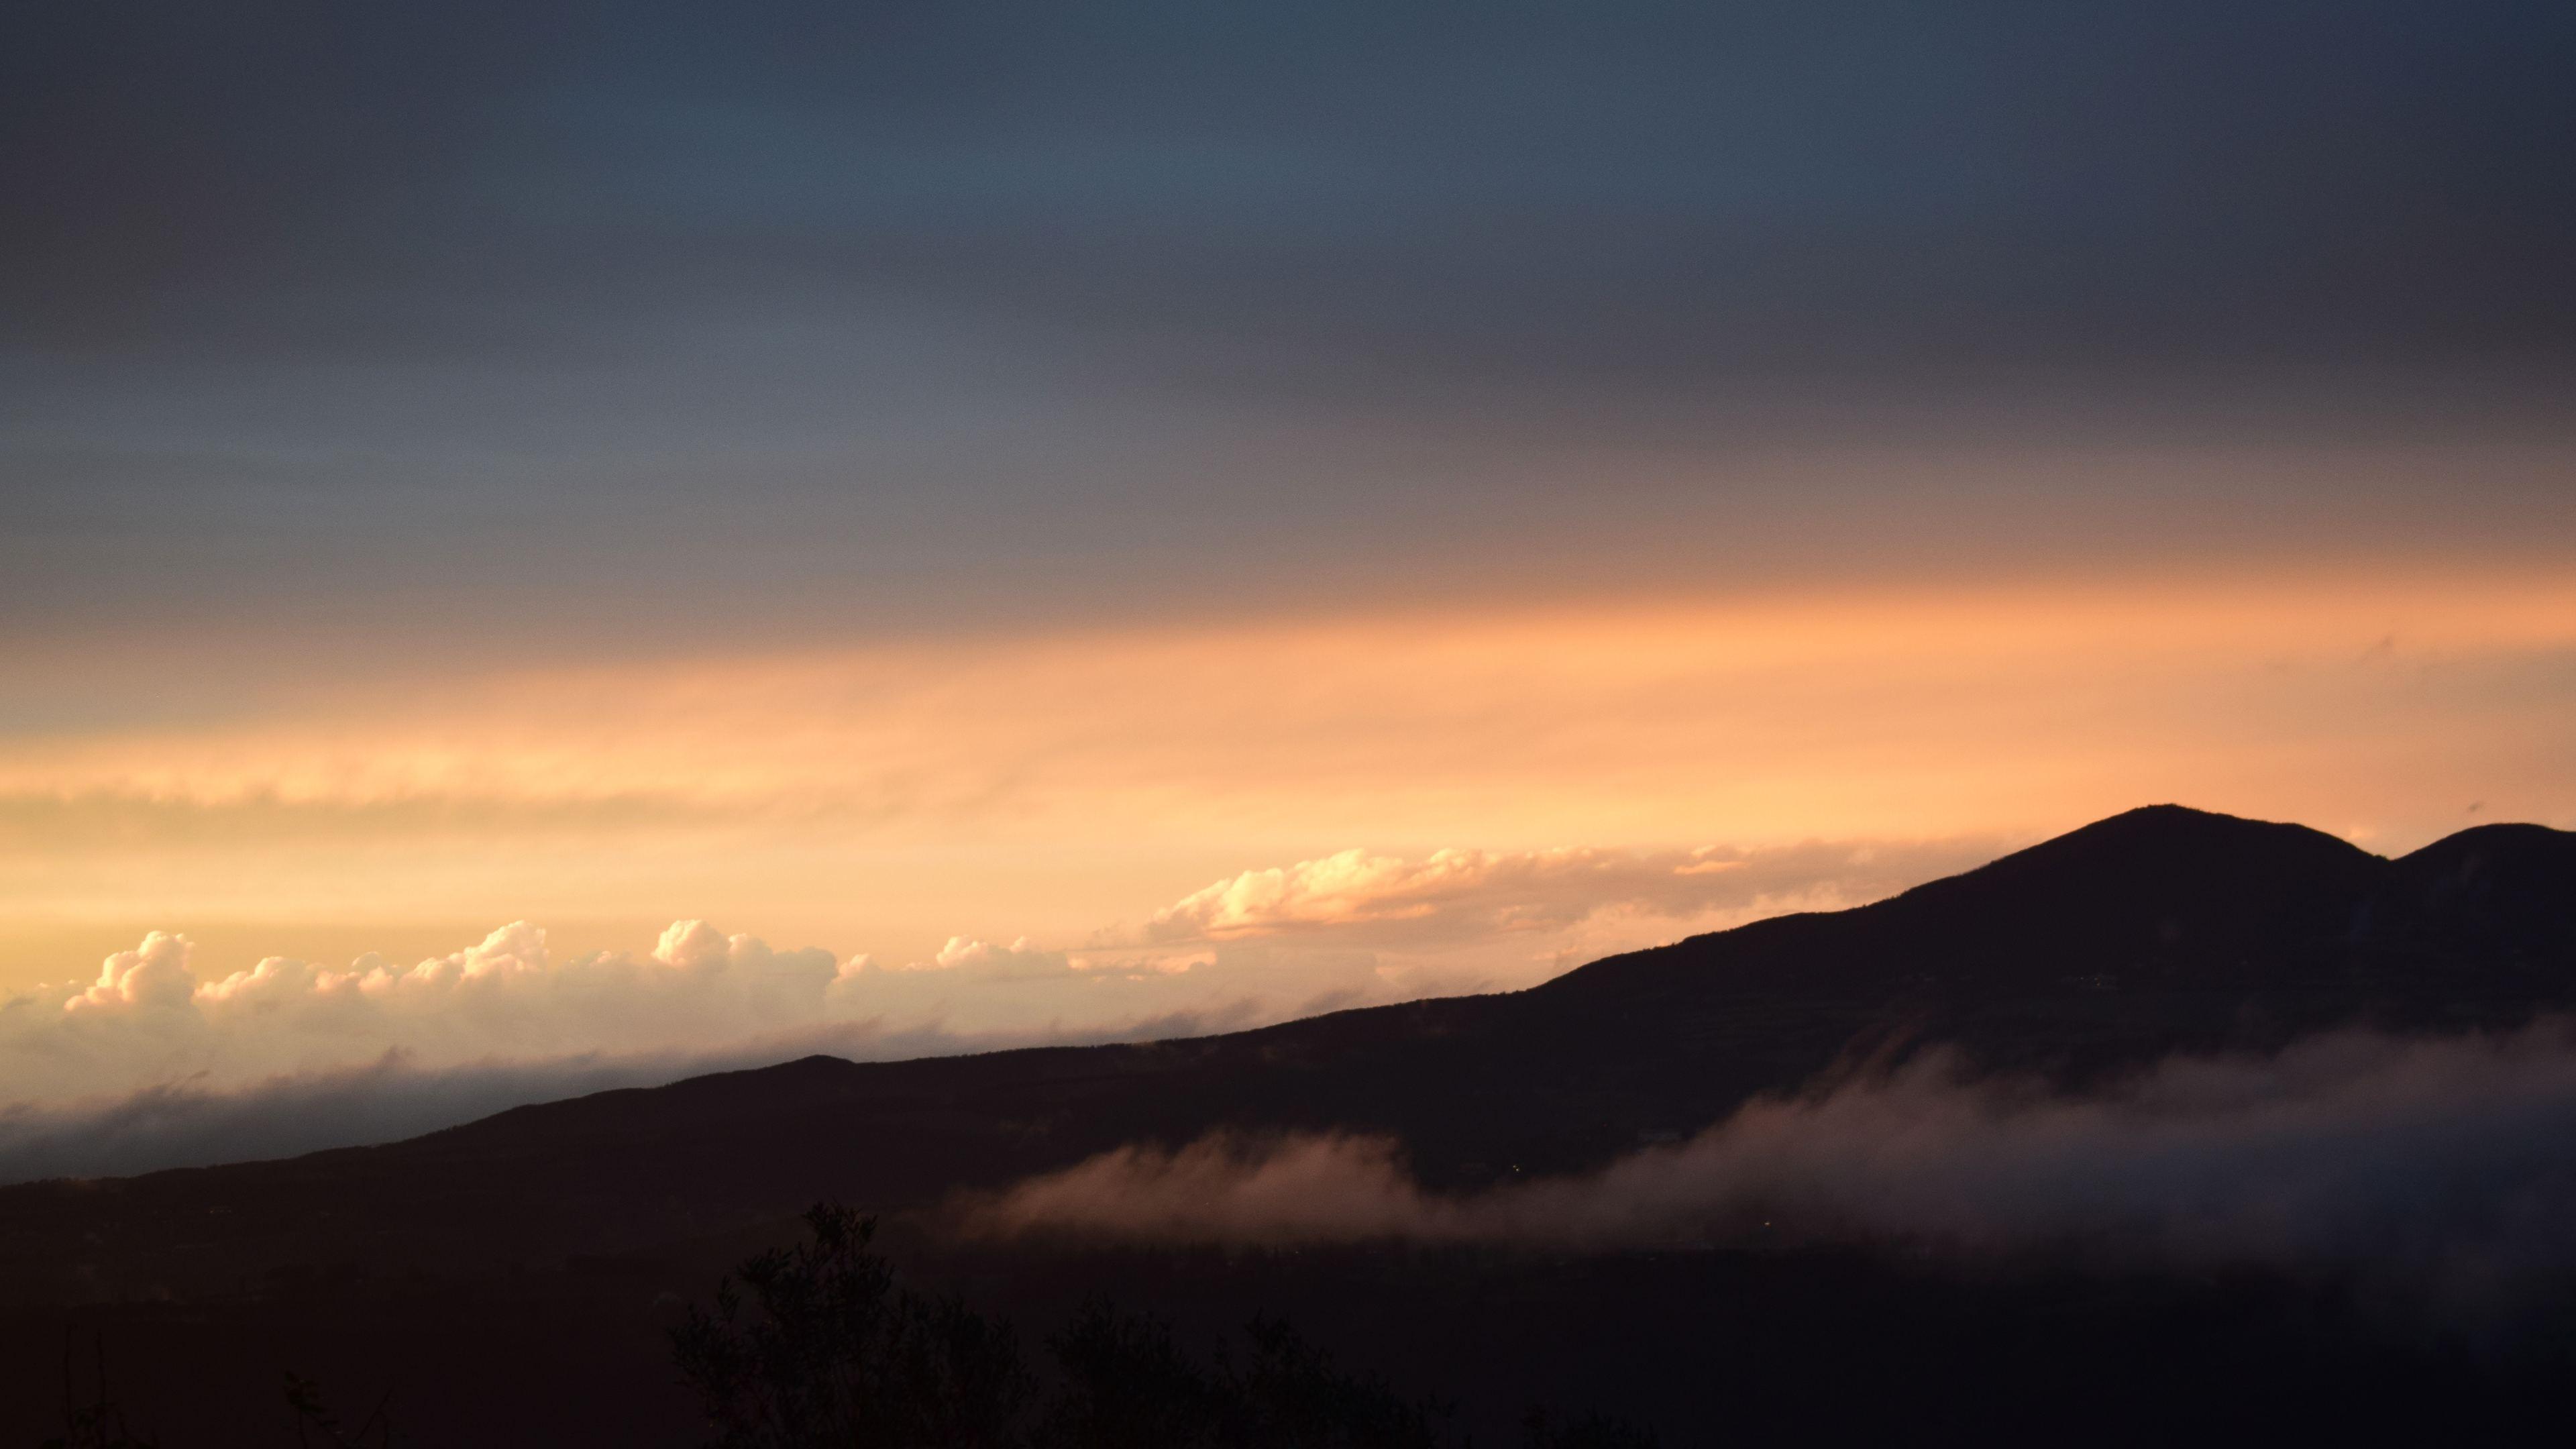 mountains clouds fog landscape 5k 1540143190 - Mountains Clouds Fog Landscape 5k - nature wallpapers, mountains wallpapers, landscape wallpapers, hd-wallpapers, fog wallpapers, clouds wallpapers, 5k wallpapers, 4k-wallpapers